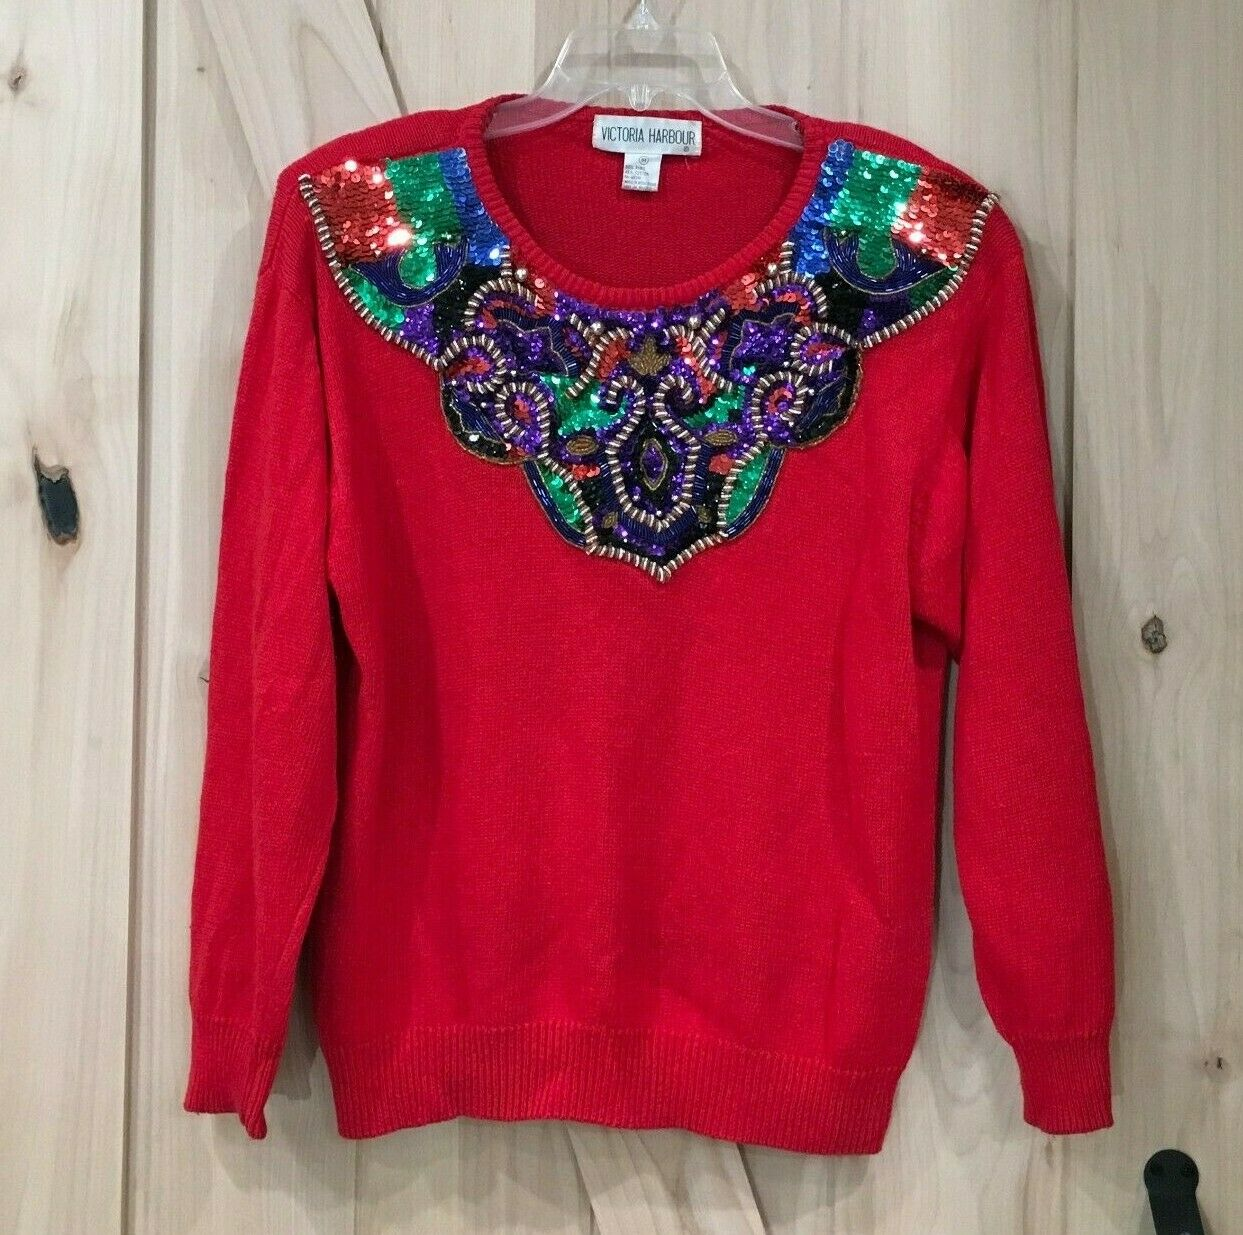 Vintage 80/'s Victoria Harbour Blue Beaded Sequin Tassel Sweater Medium